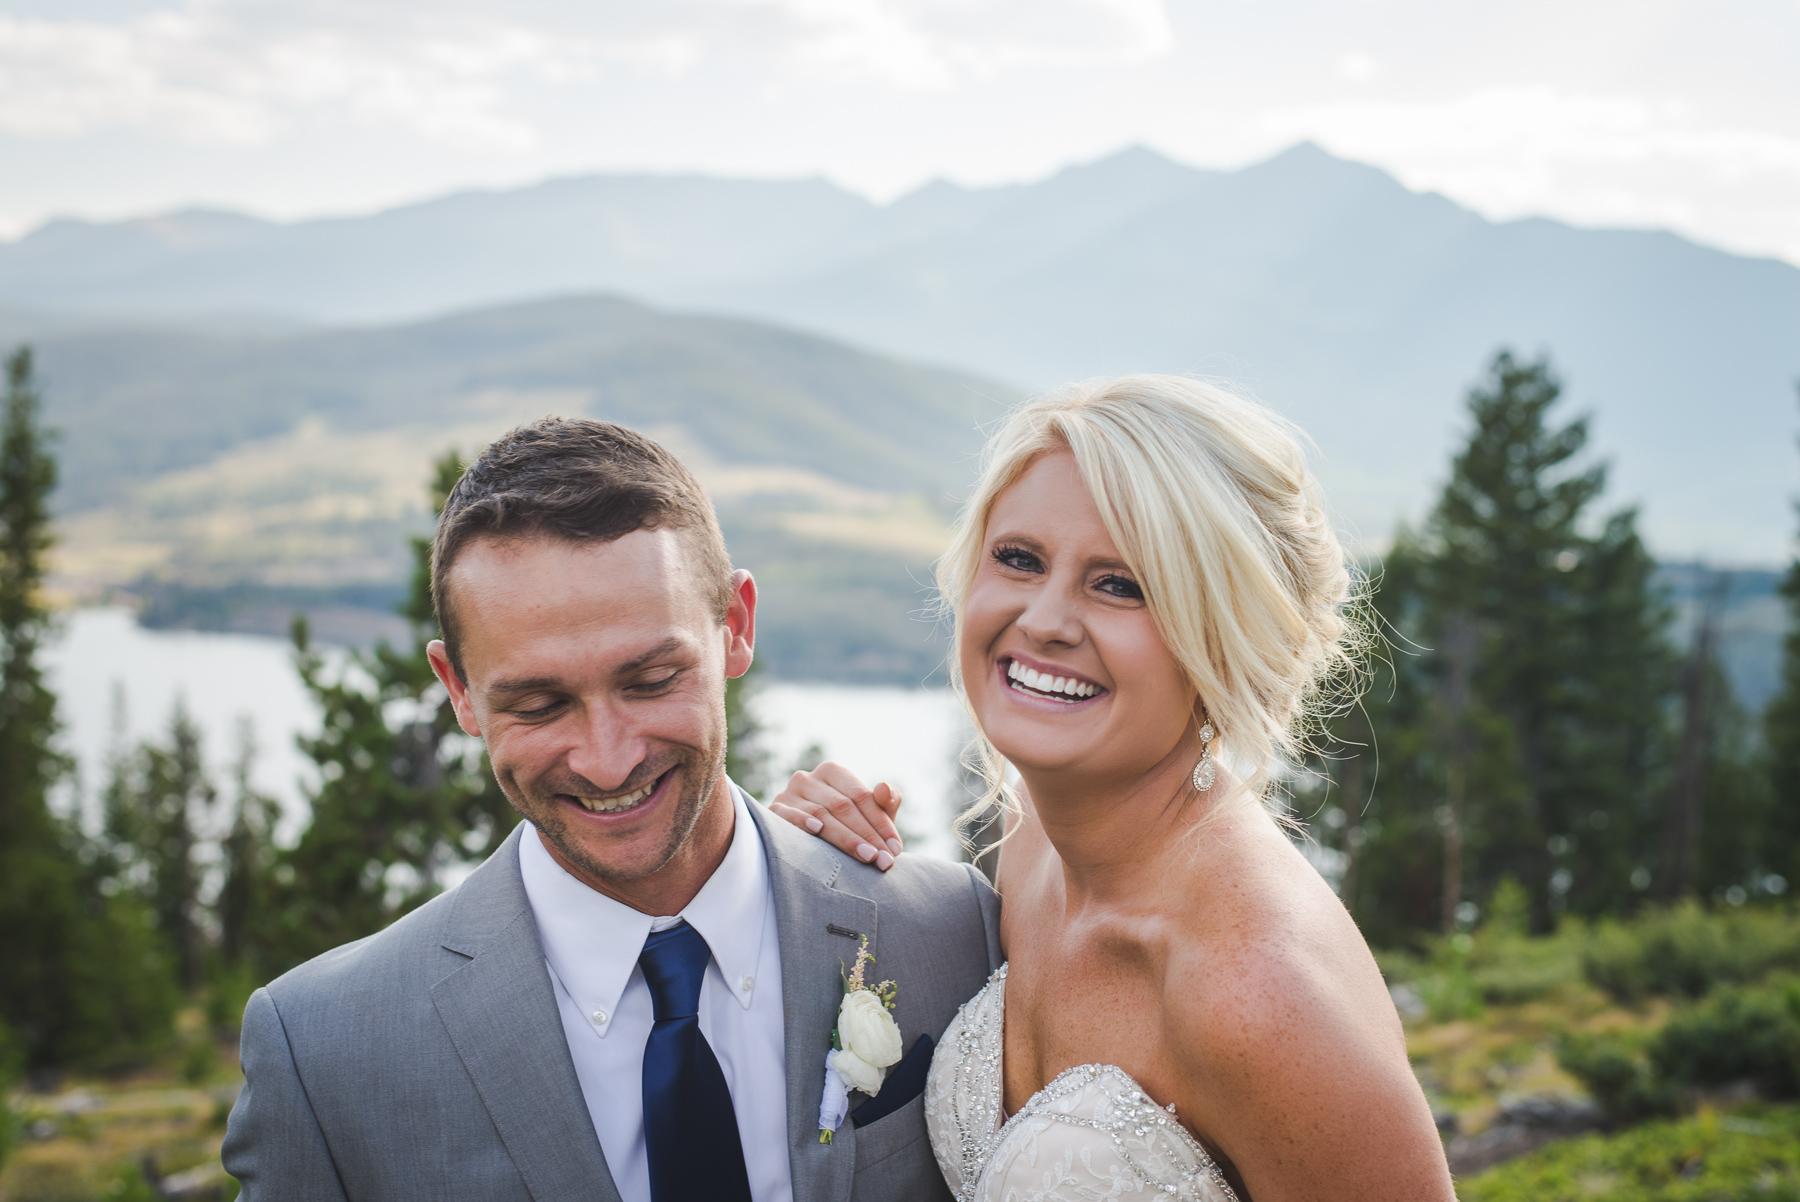 colorado bride and groom laughing